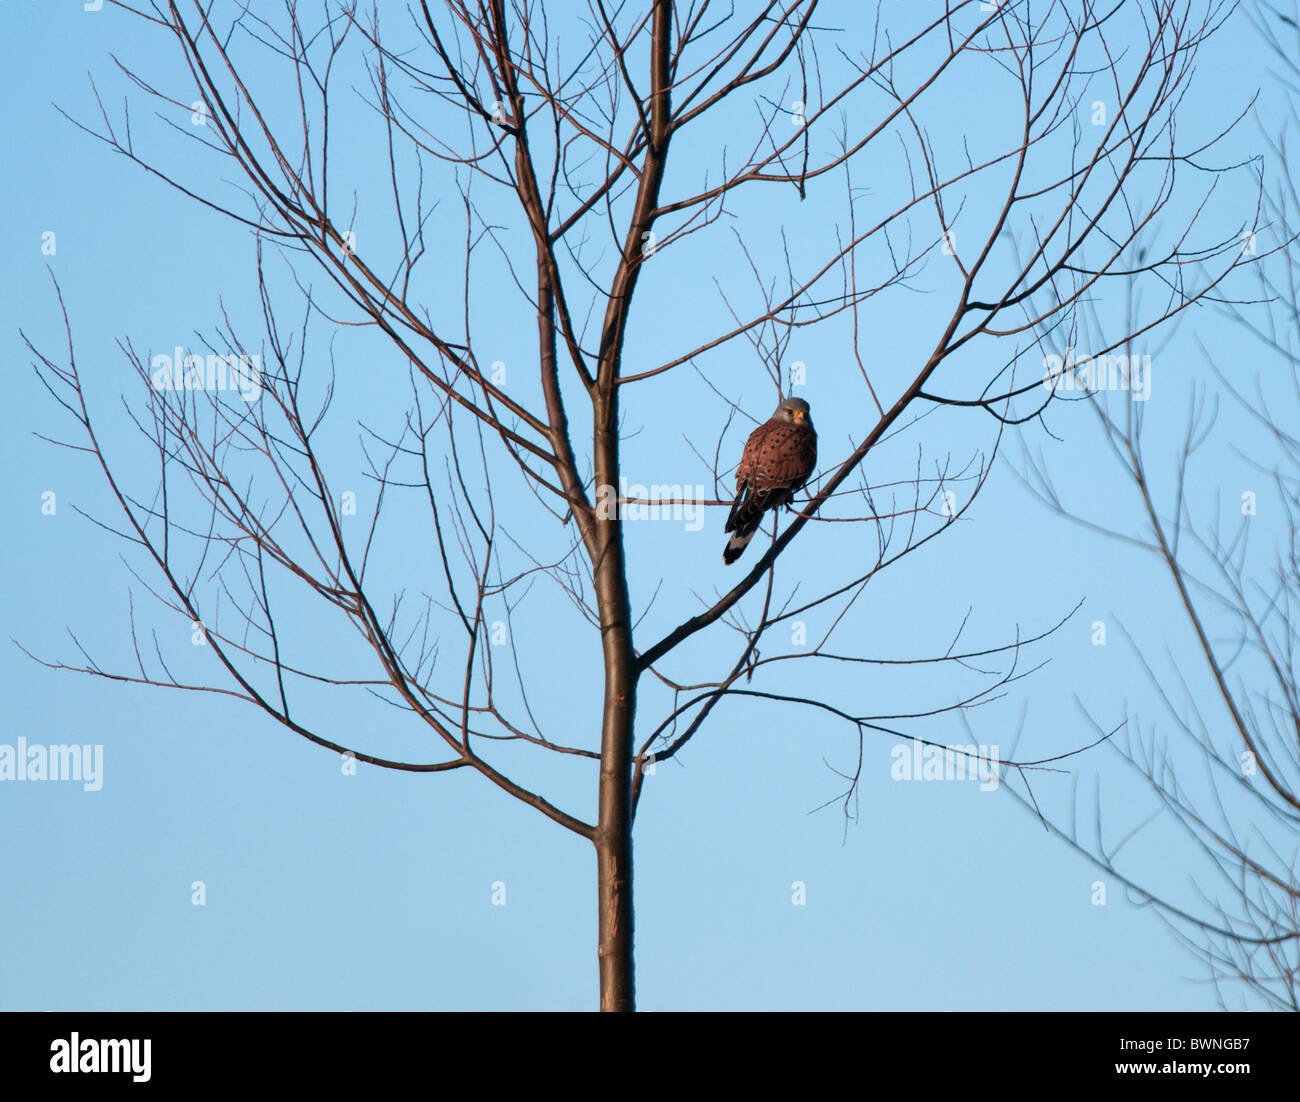 Wild Kestrel Perched in Tree - Stock Image